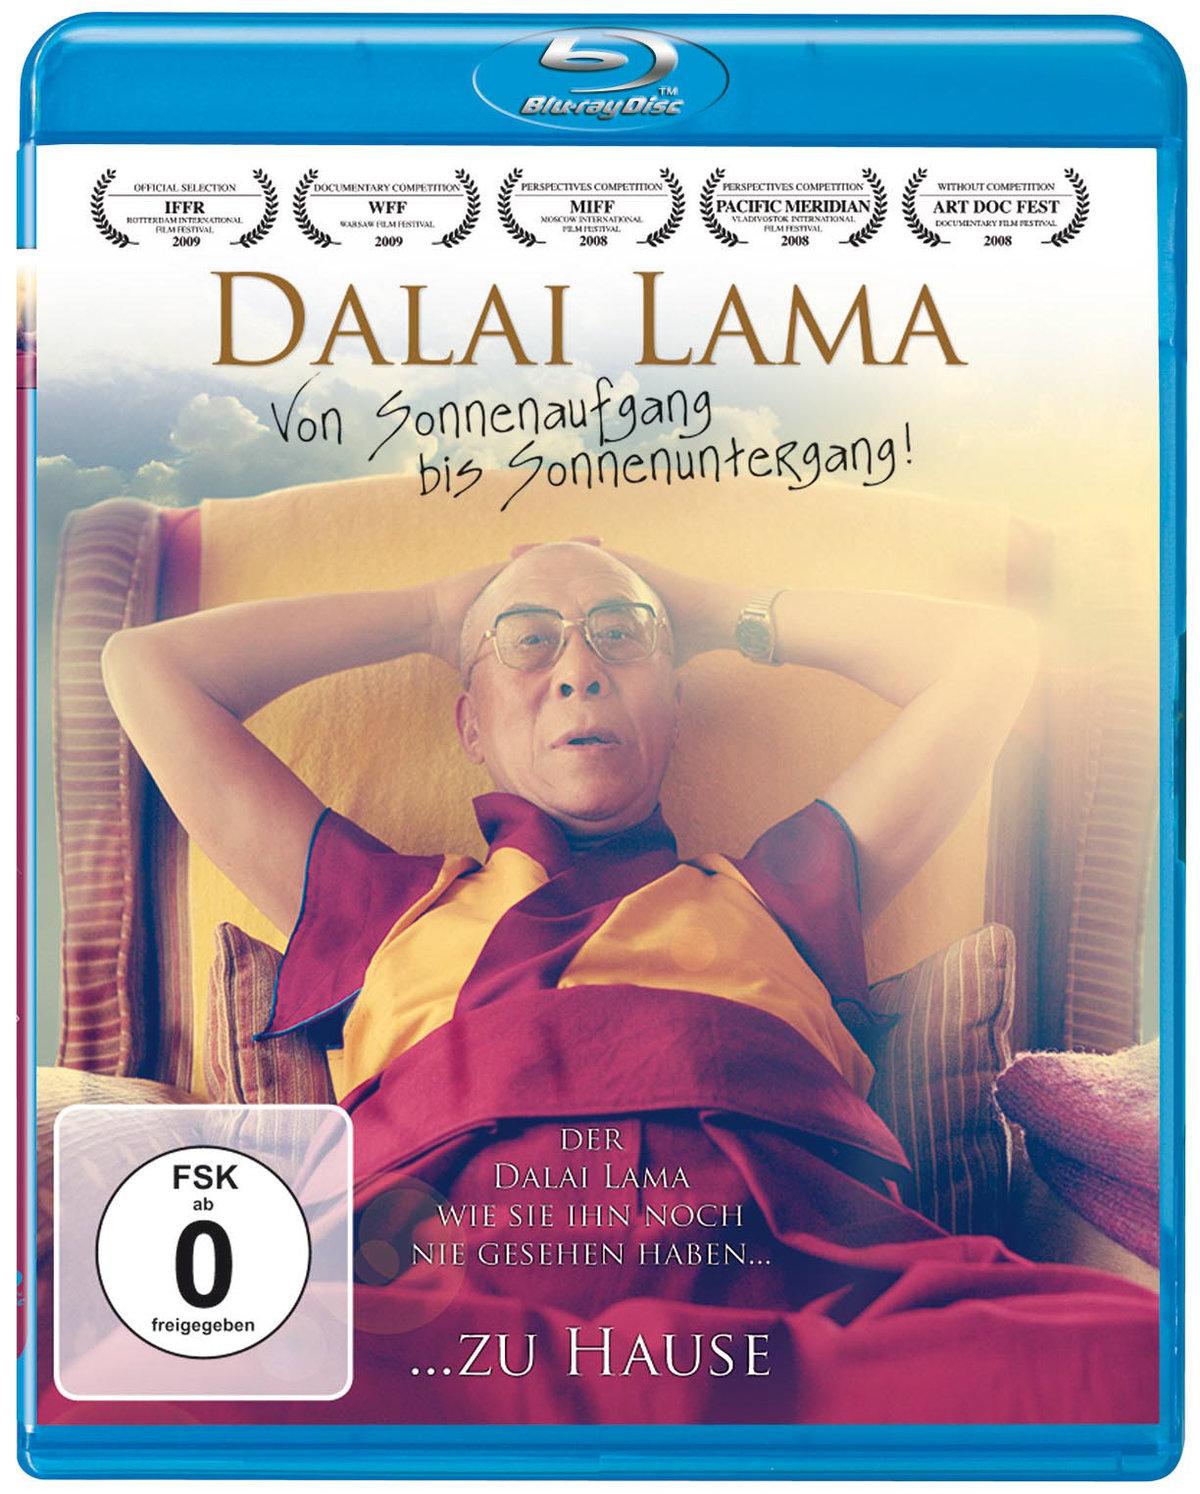 Dalai Lama (2008) - Von Sonnenaufgang bis Sonnenuntergang!